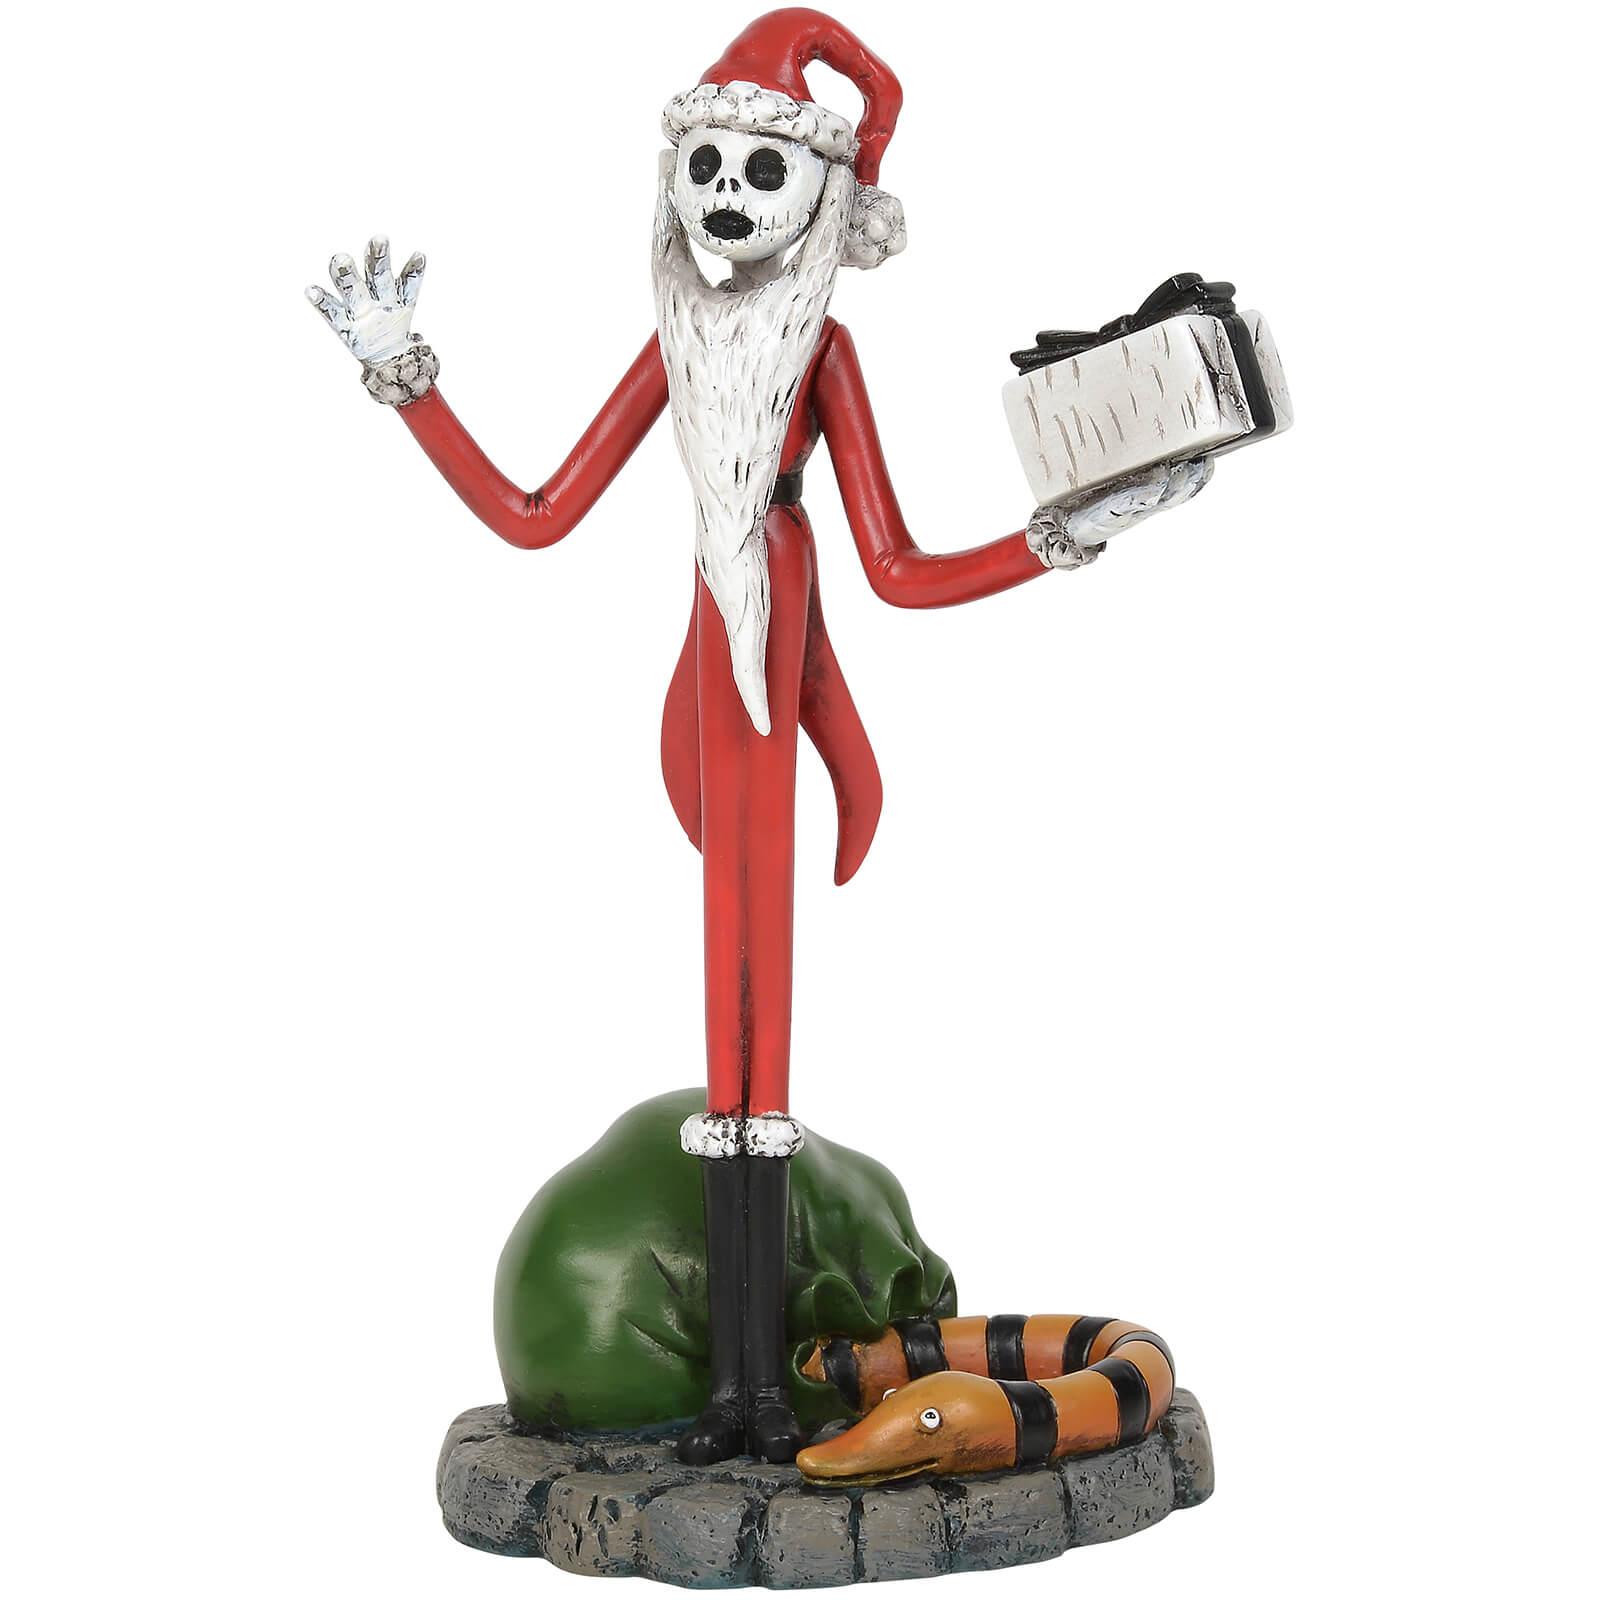 Image of The Nightmare Before Christmas Village Jack Skellington Steals Christmas Figurine 11cm